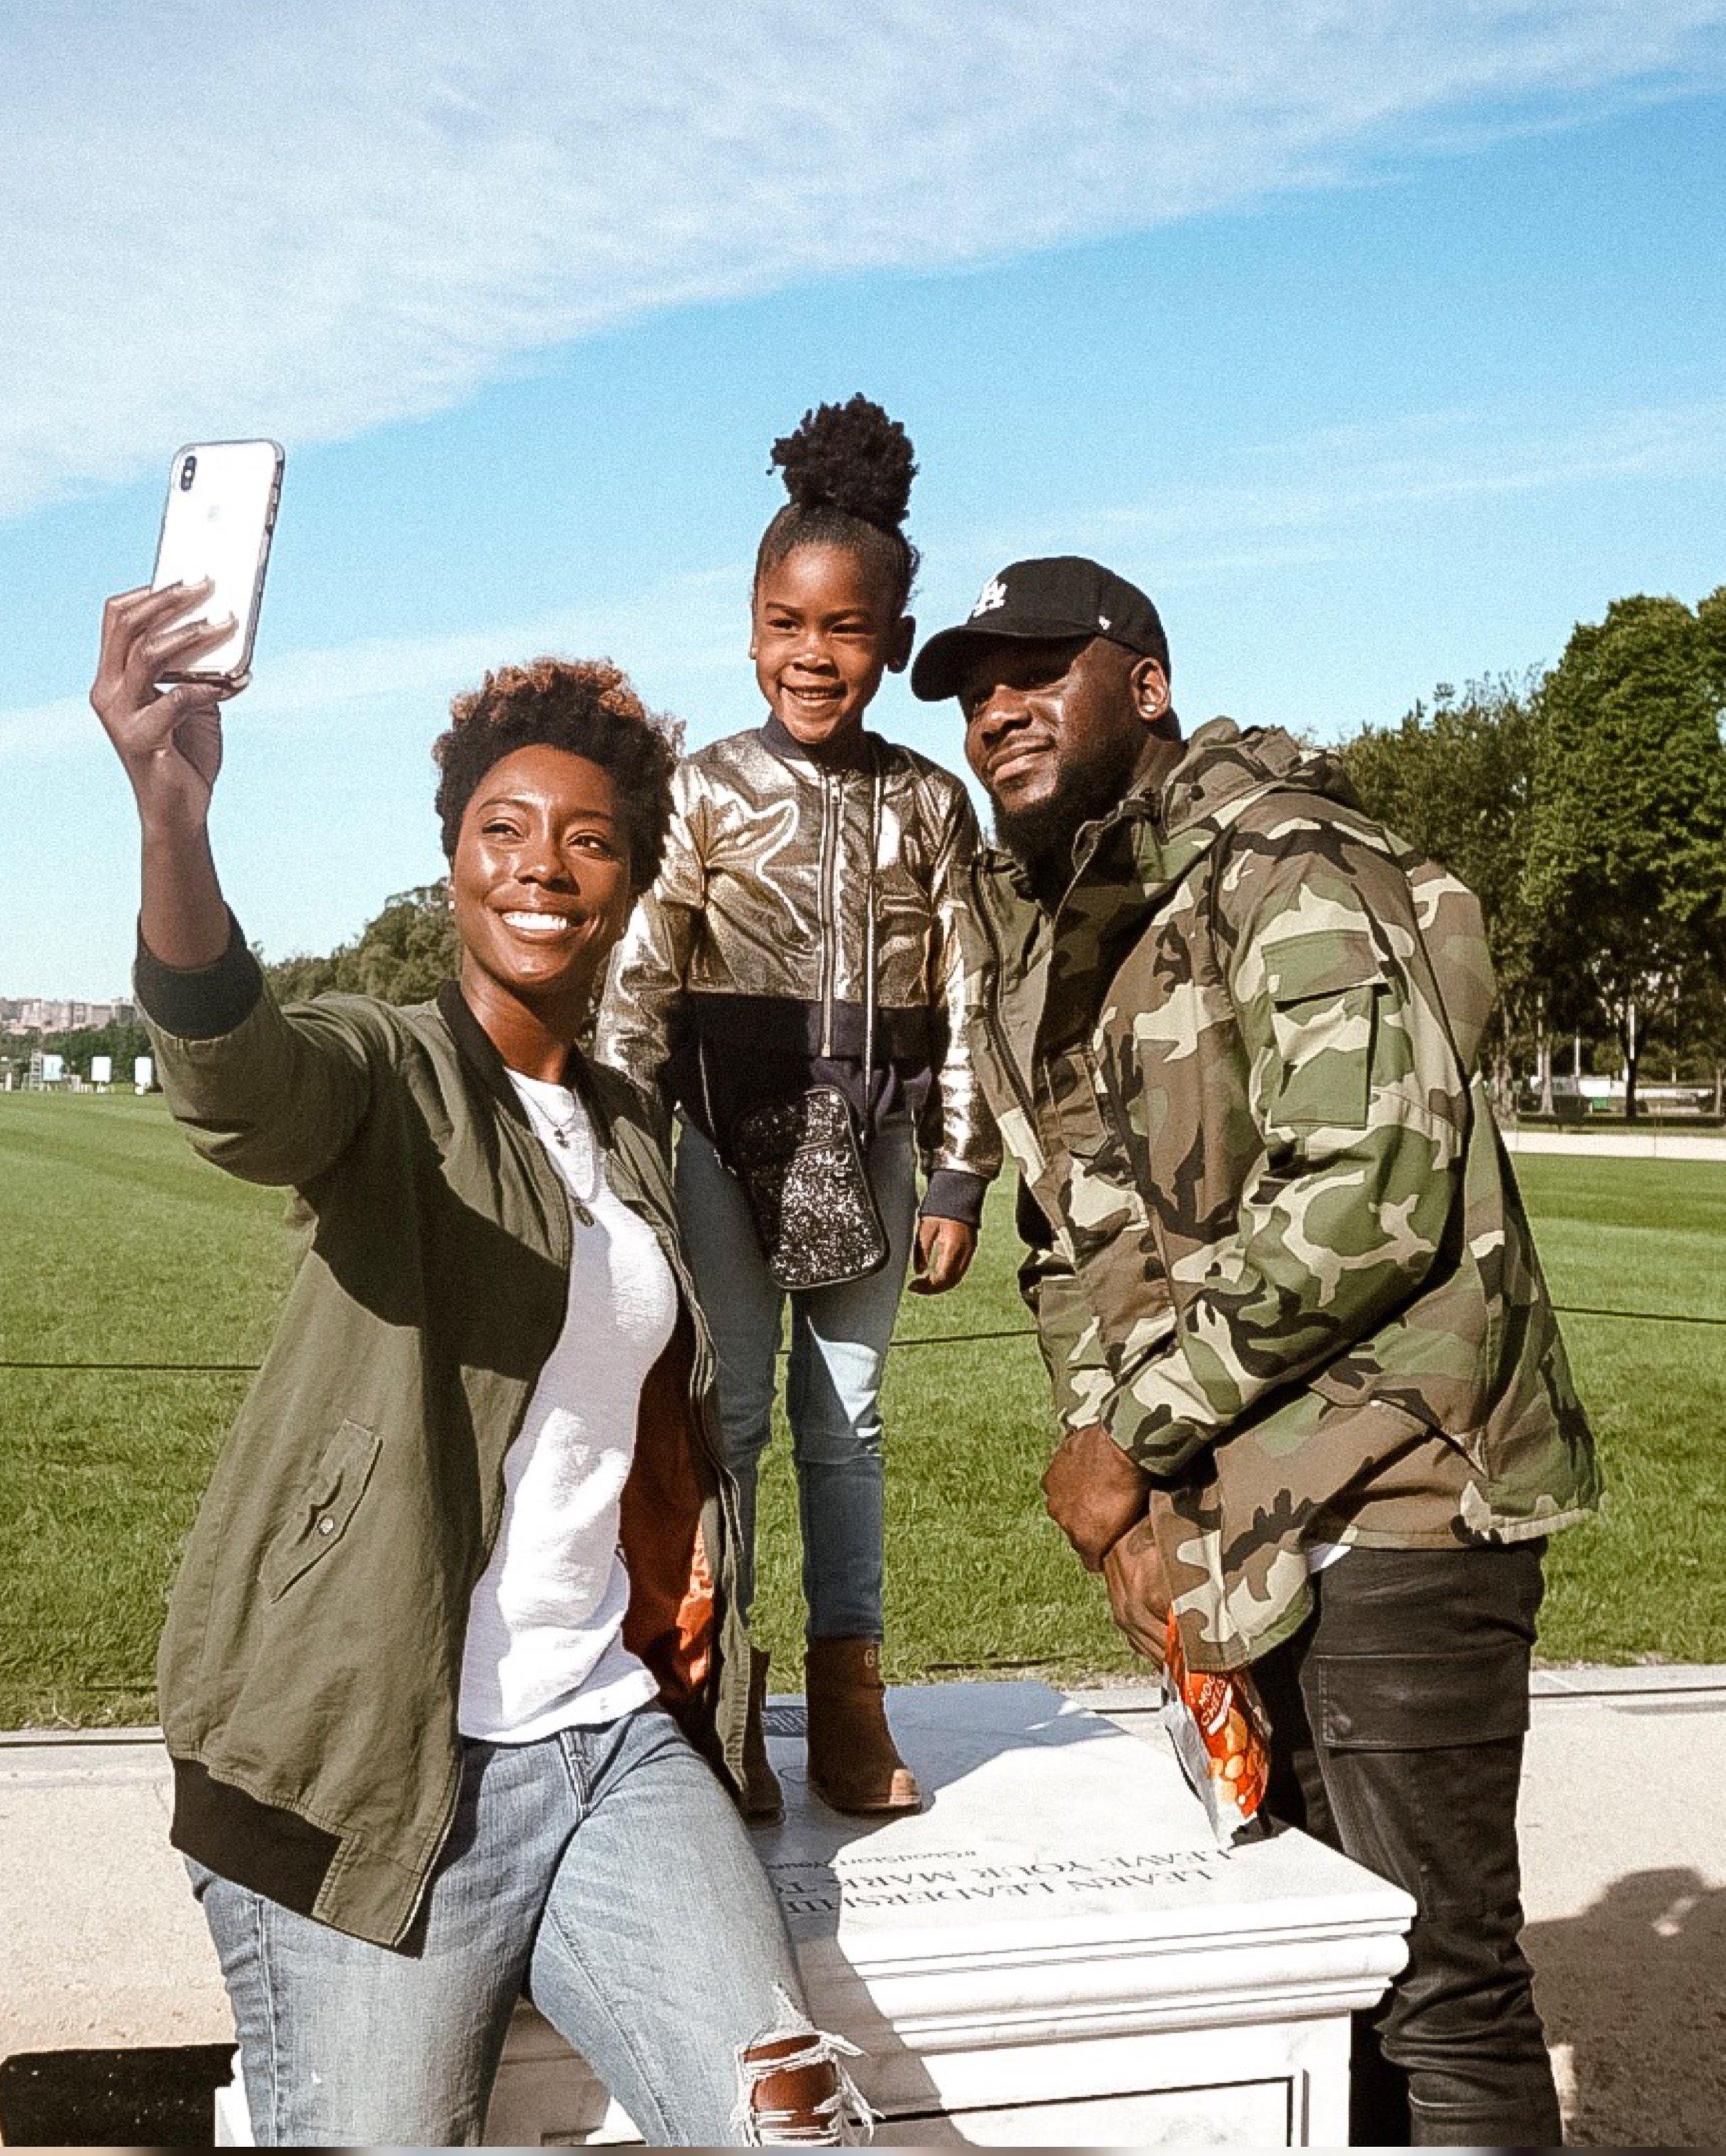 Allstate_Foundation_Good_Starts_Young_DC_Dayna_Bolden_Family_9.JPG